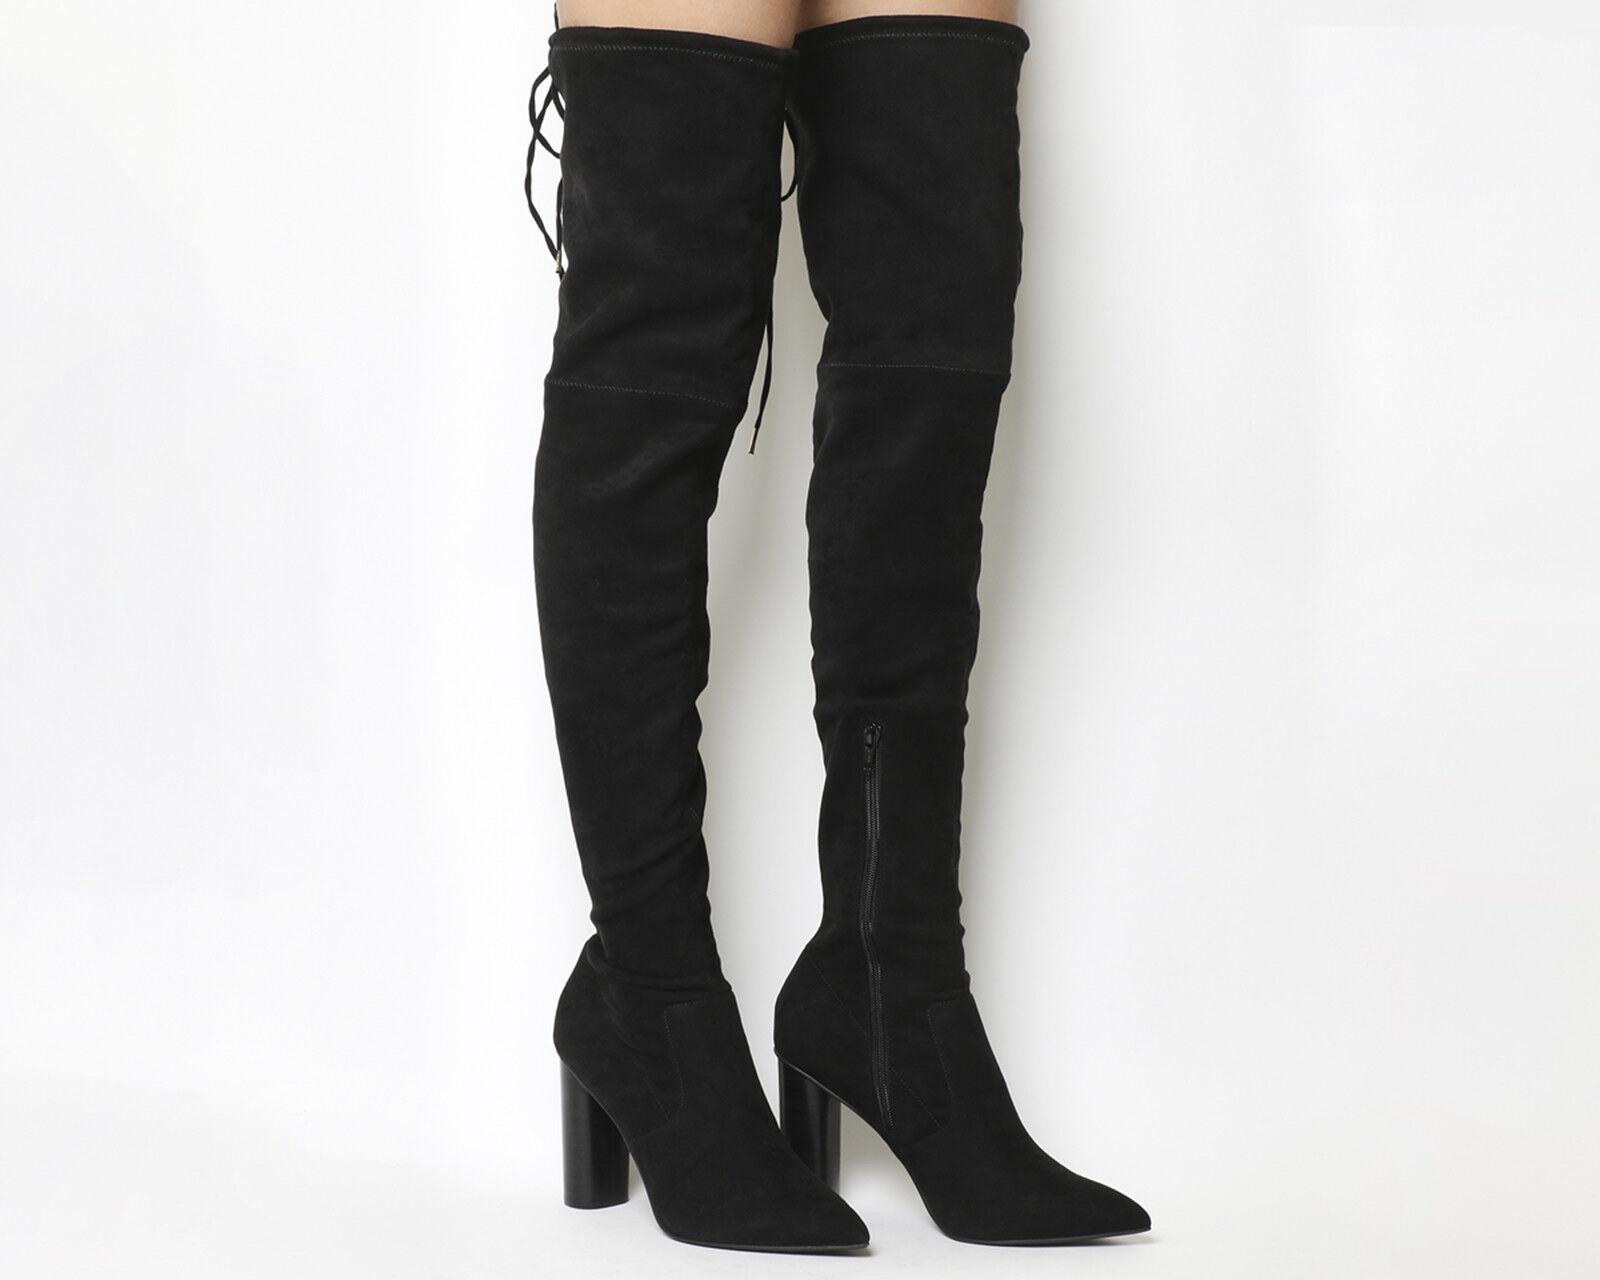 Office Kandy Shop Block Heel Over The Knee Damens Stiefel UK Größe 7